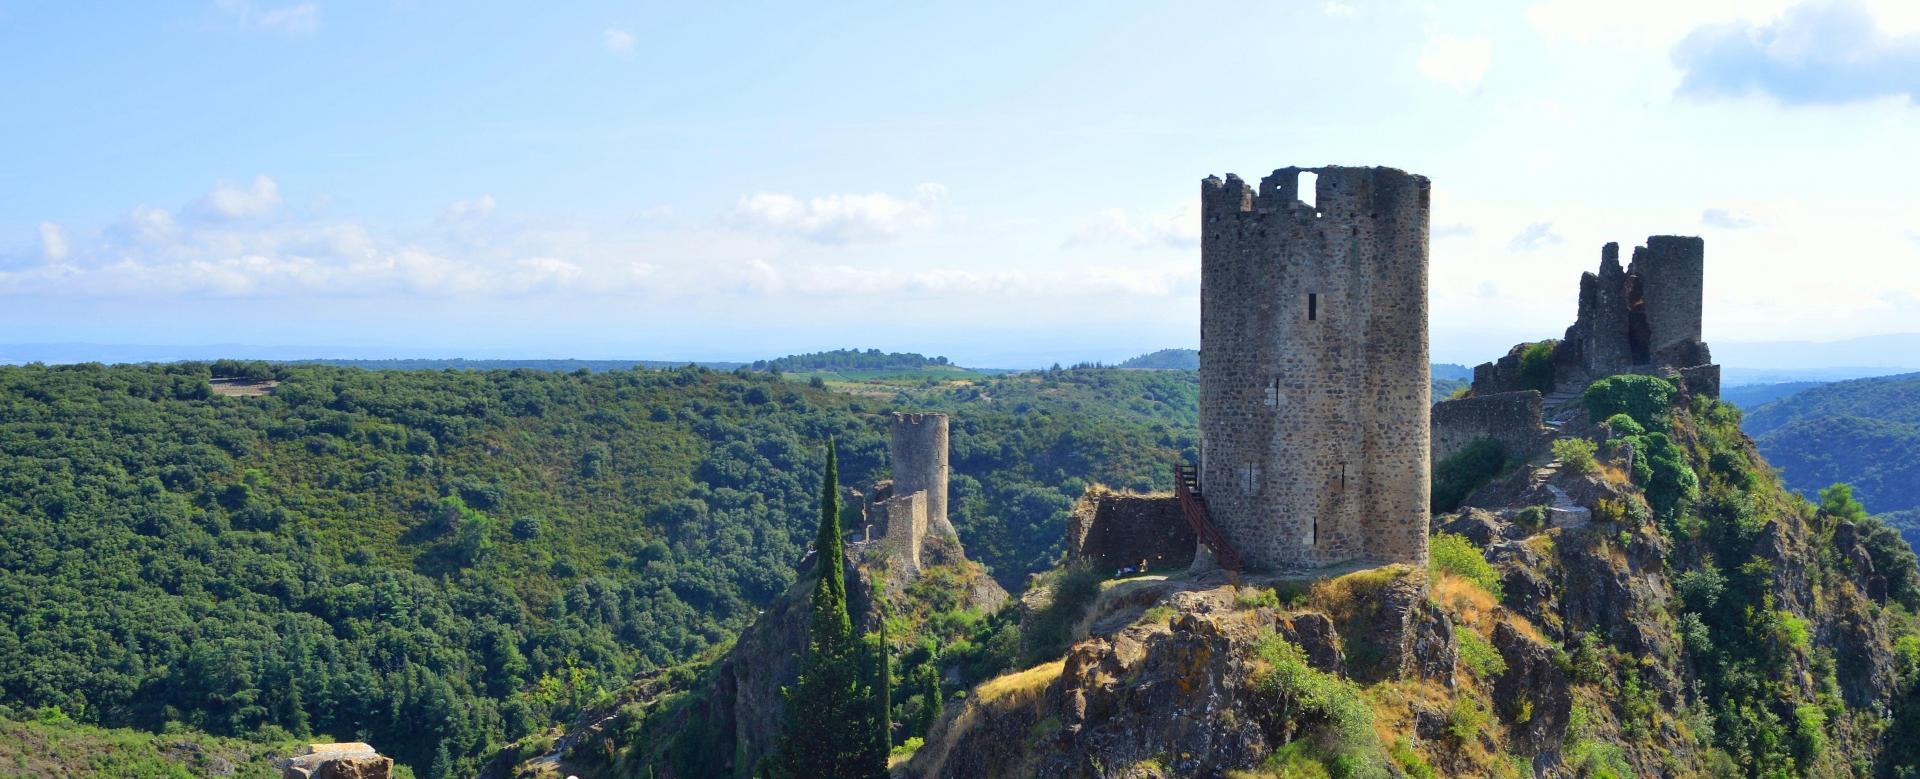 Voyage à pied : Châteaux cathares